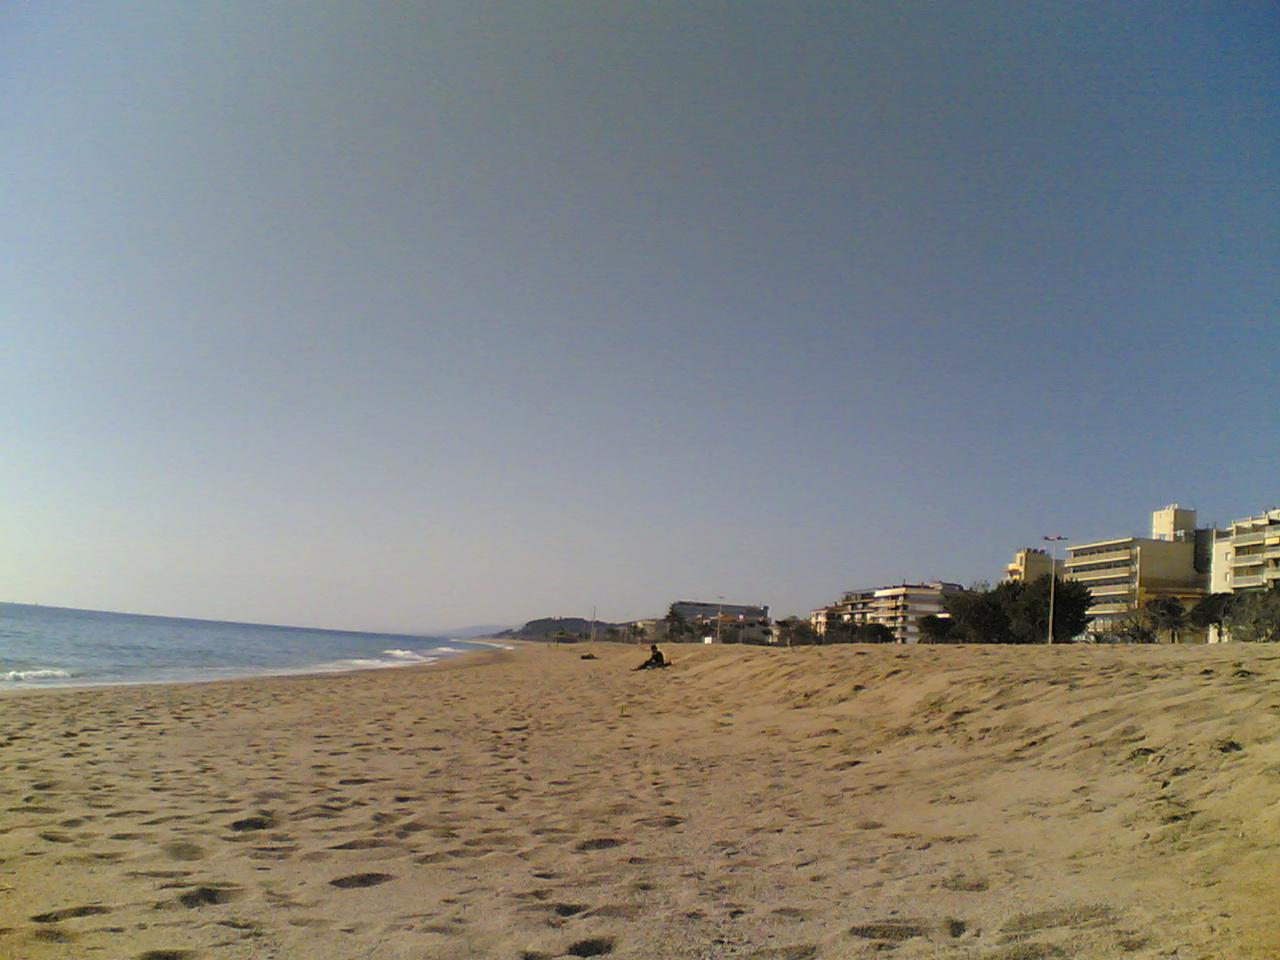 http://upload.wikimedia.org/wikipedia/commons/a/ac/Pineda_de_Mar_beach_%2802-2008%29.jpg